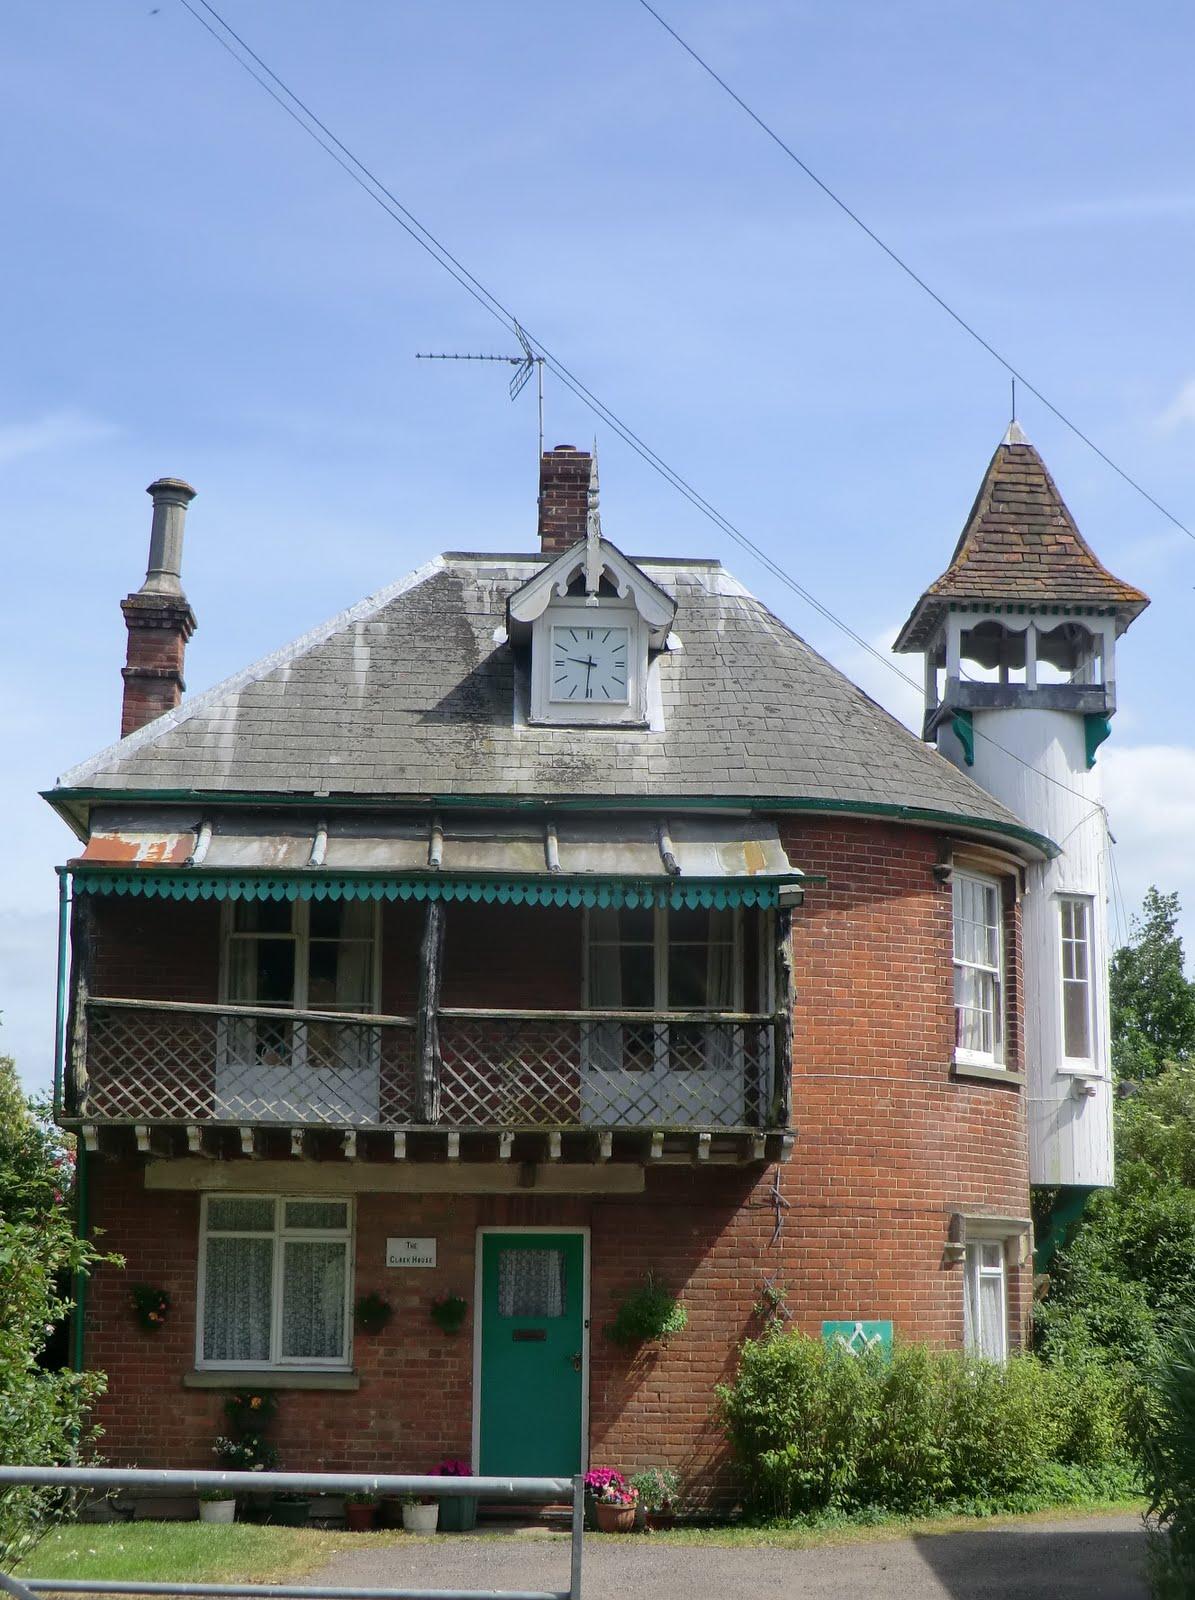 CIMG2097 The Clock House, Five Oak Green